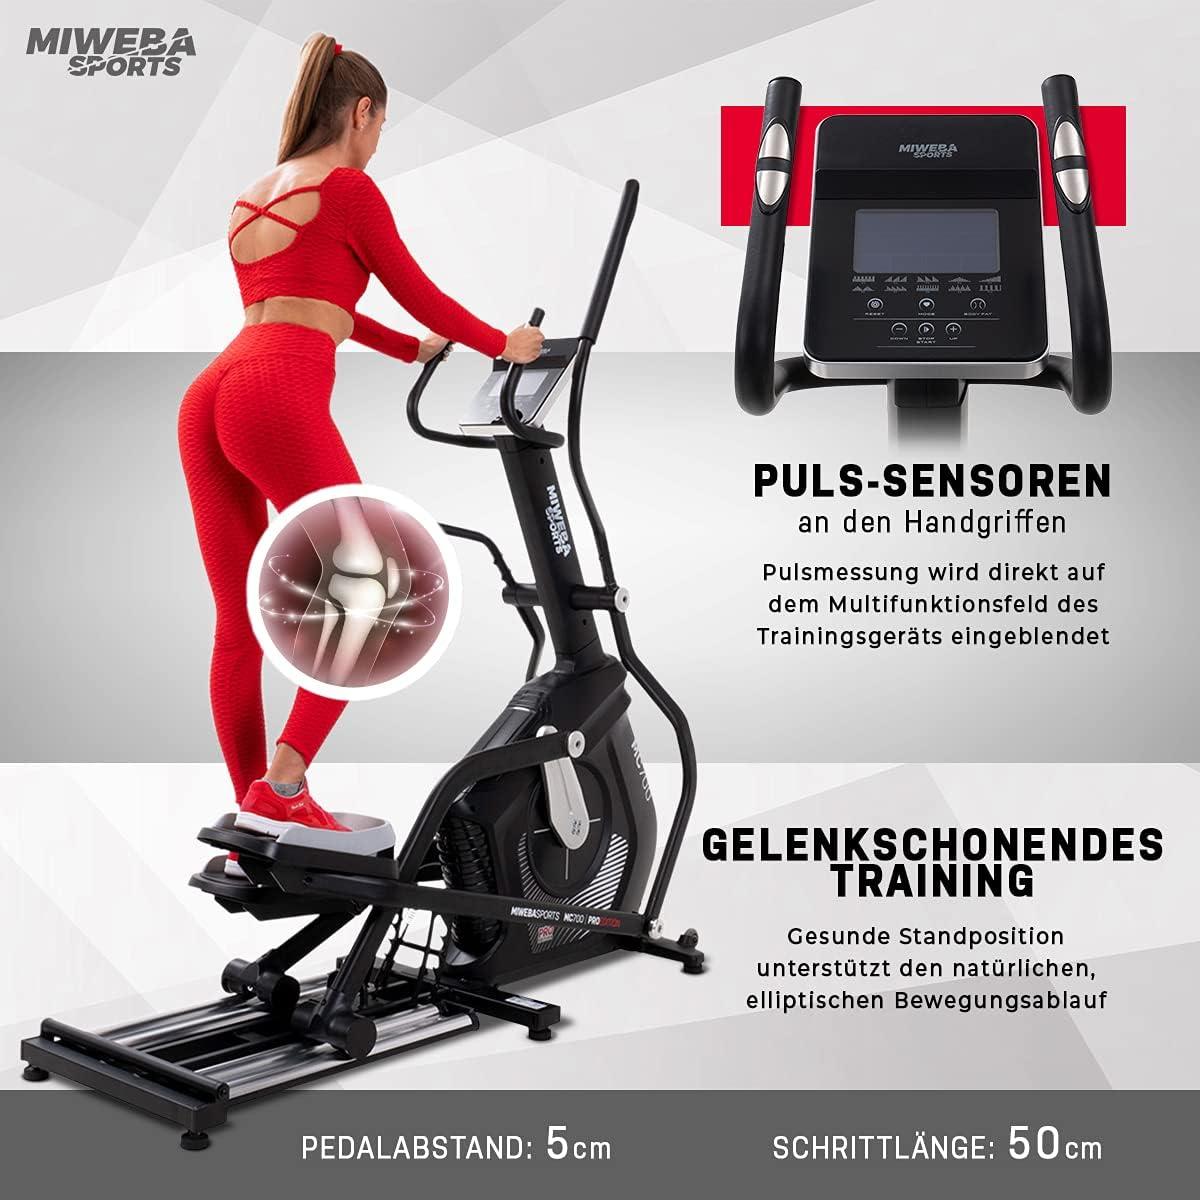 Miweba Sports Crosstrainer MC700 - Ergonomie & Gesundheit